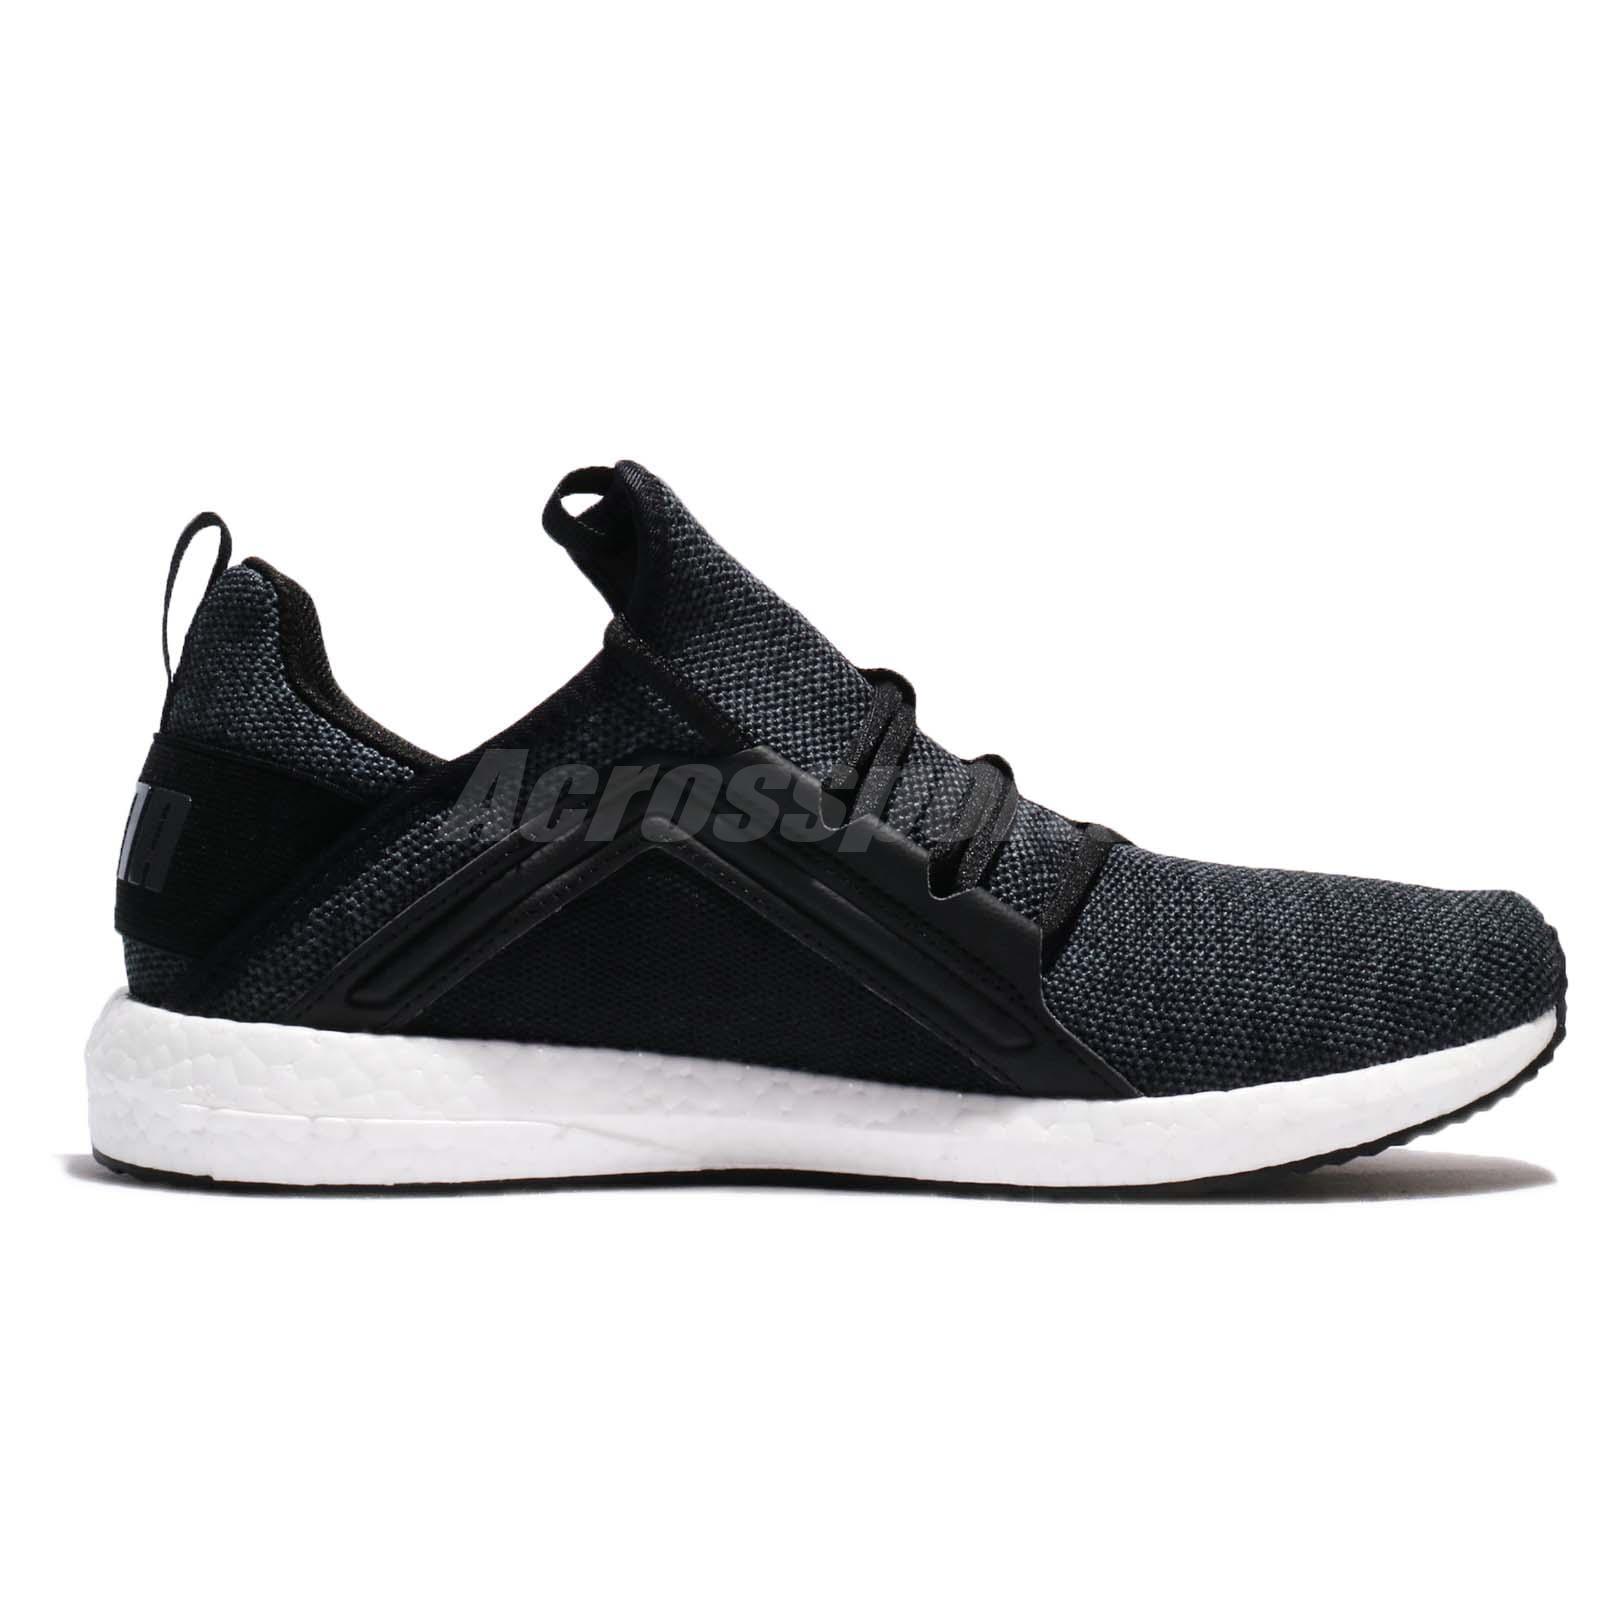 2e0816ce69da Puma Mega NRGY Knit Black Asphalt White Men Running Shoes Sneakers ...